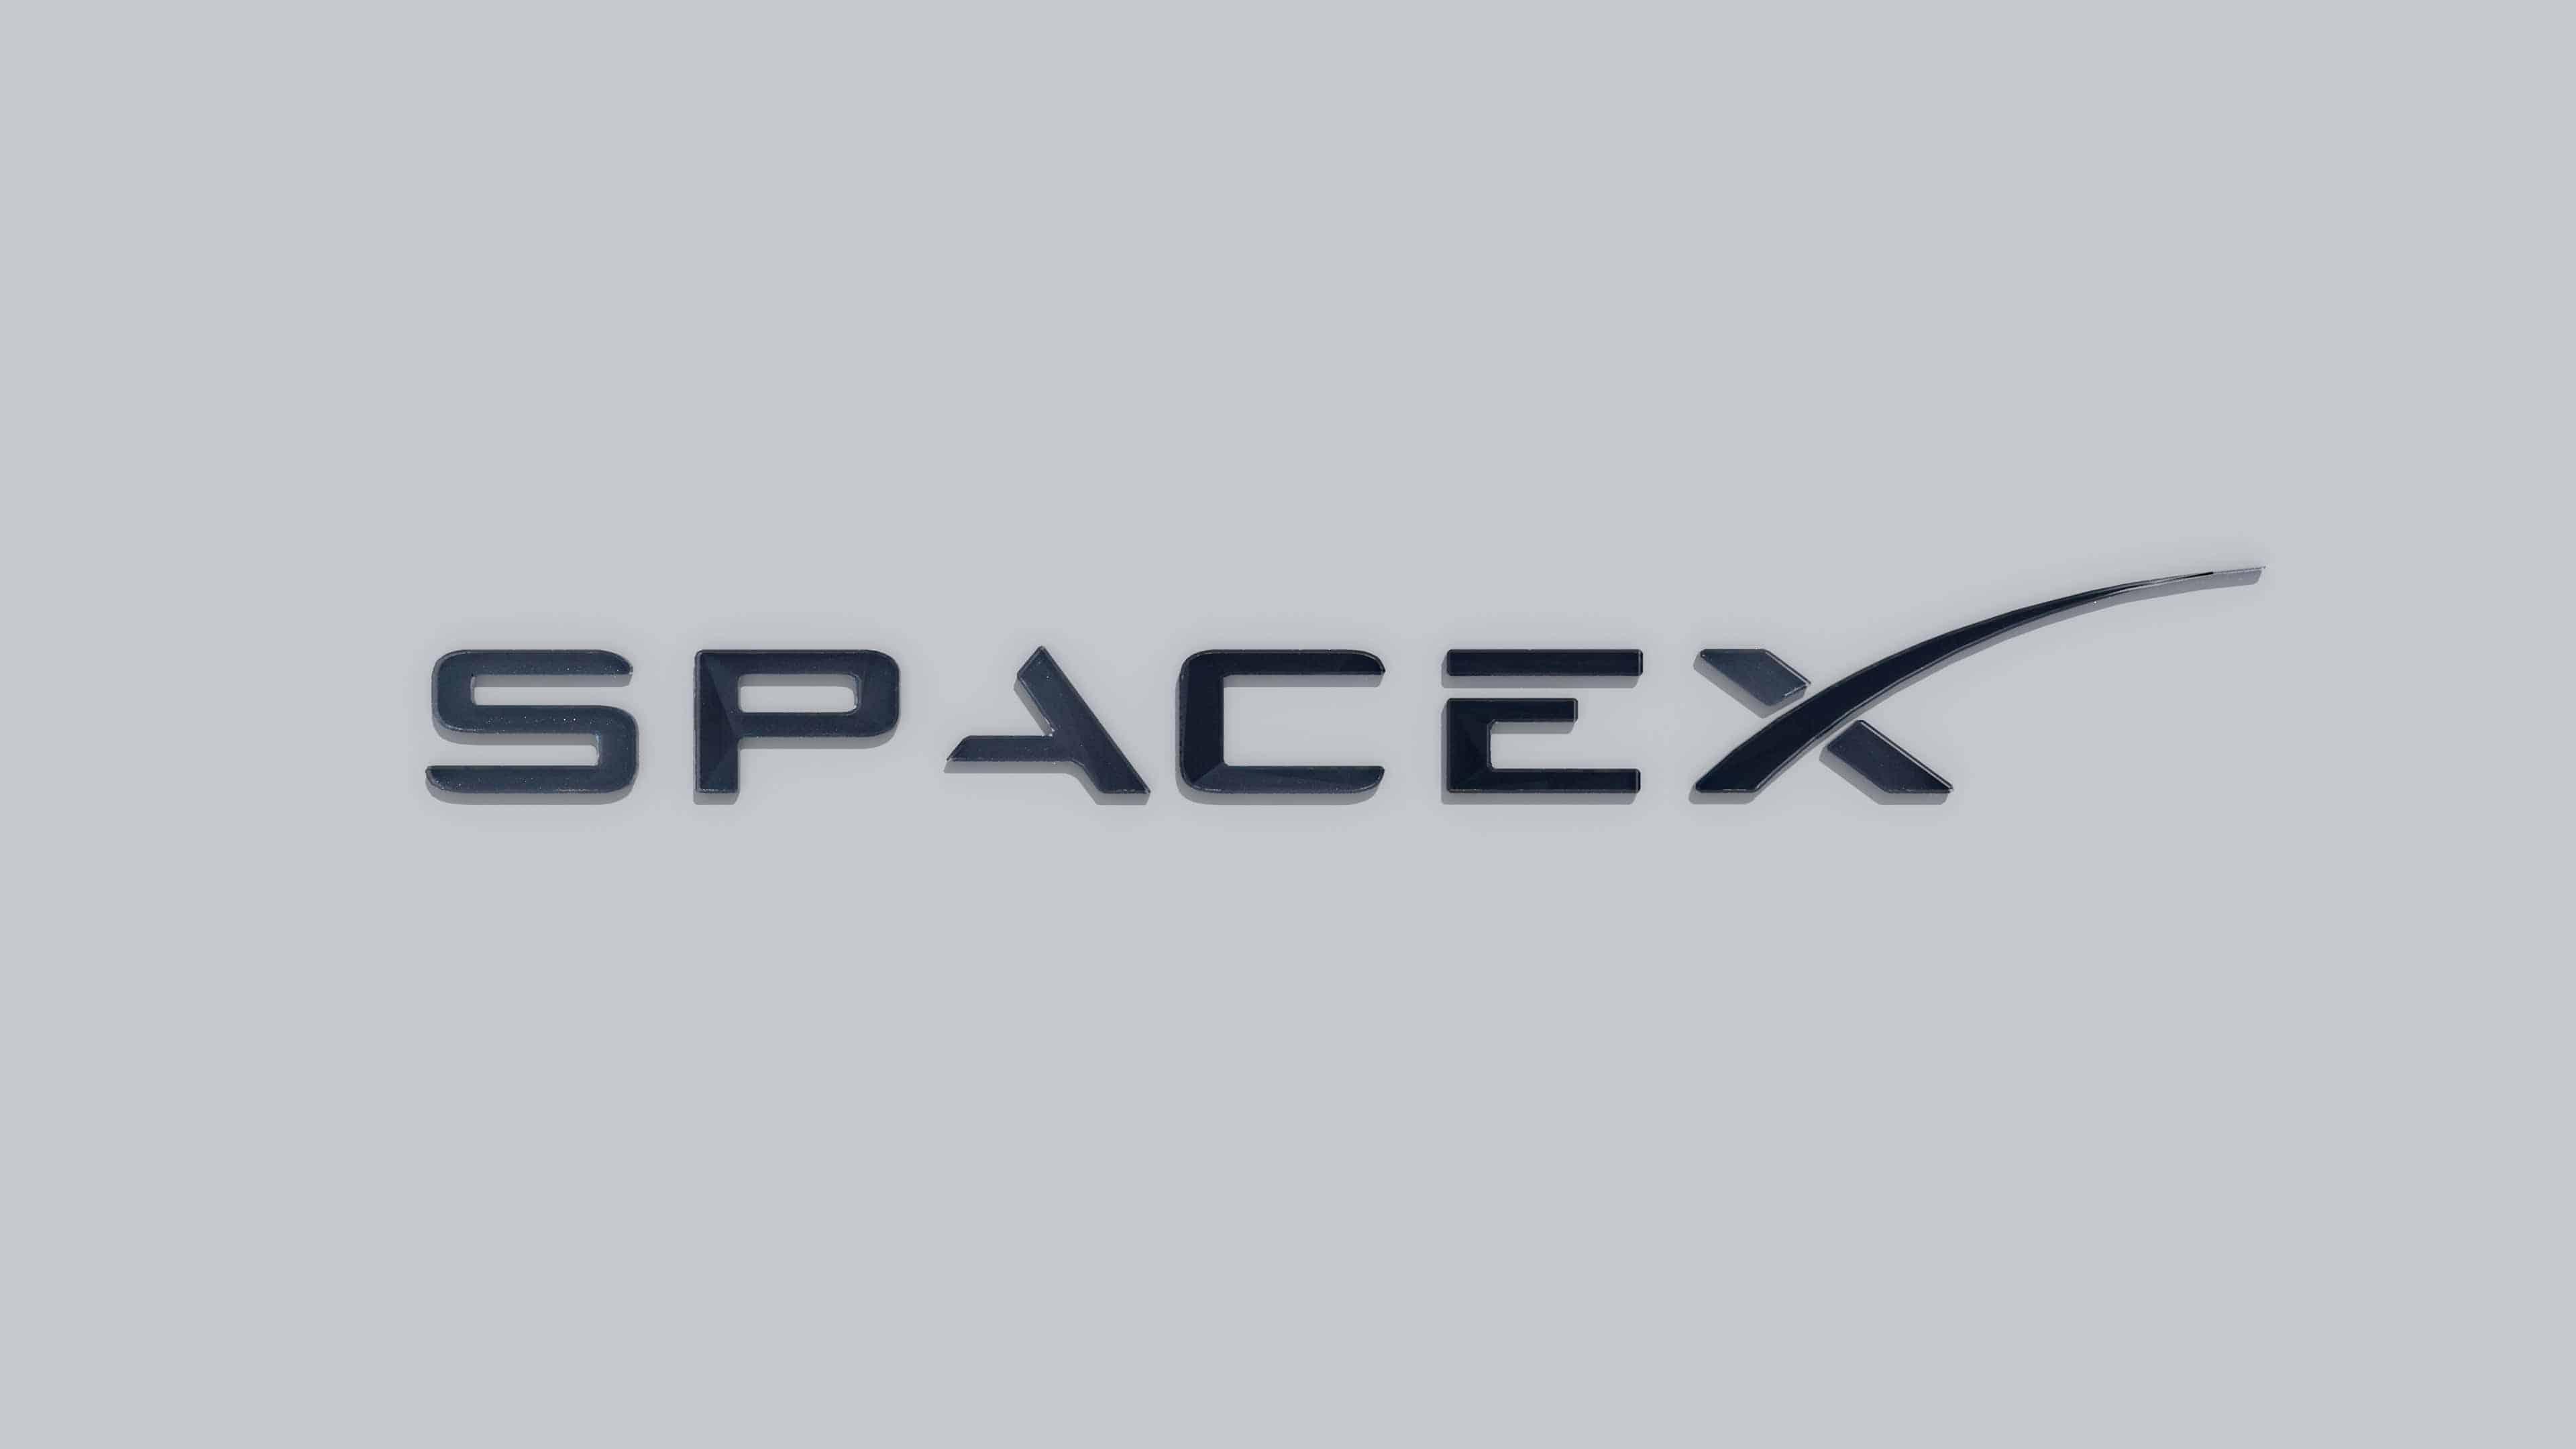 spacex logo uhd 4k wallpaper